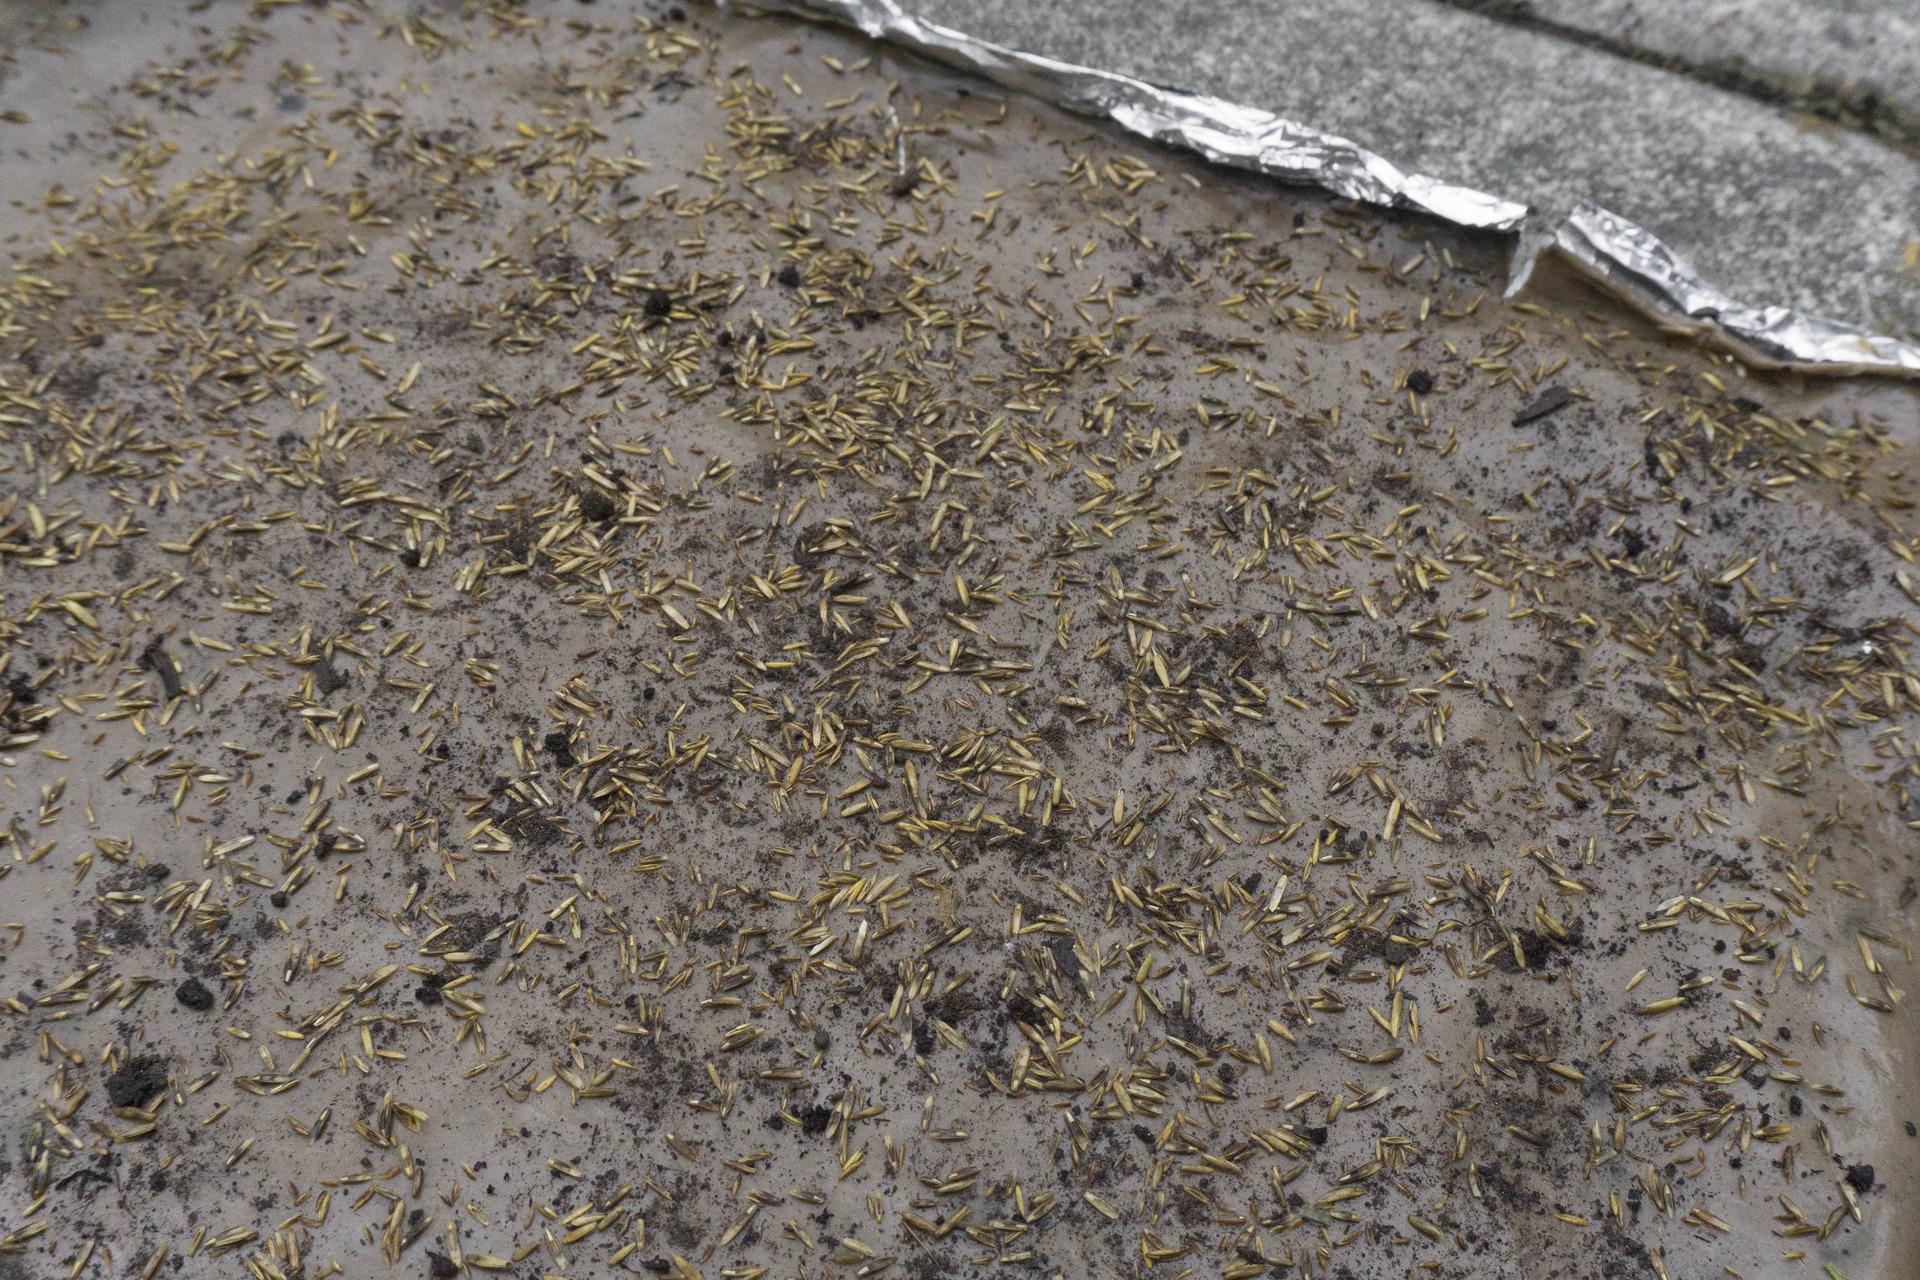 seeds, pieces of ground